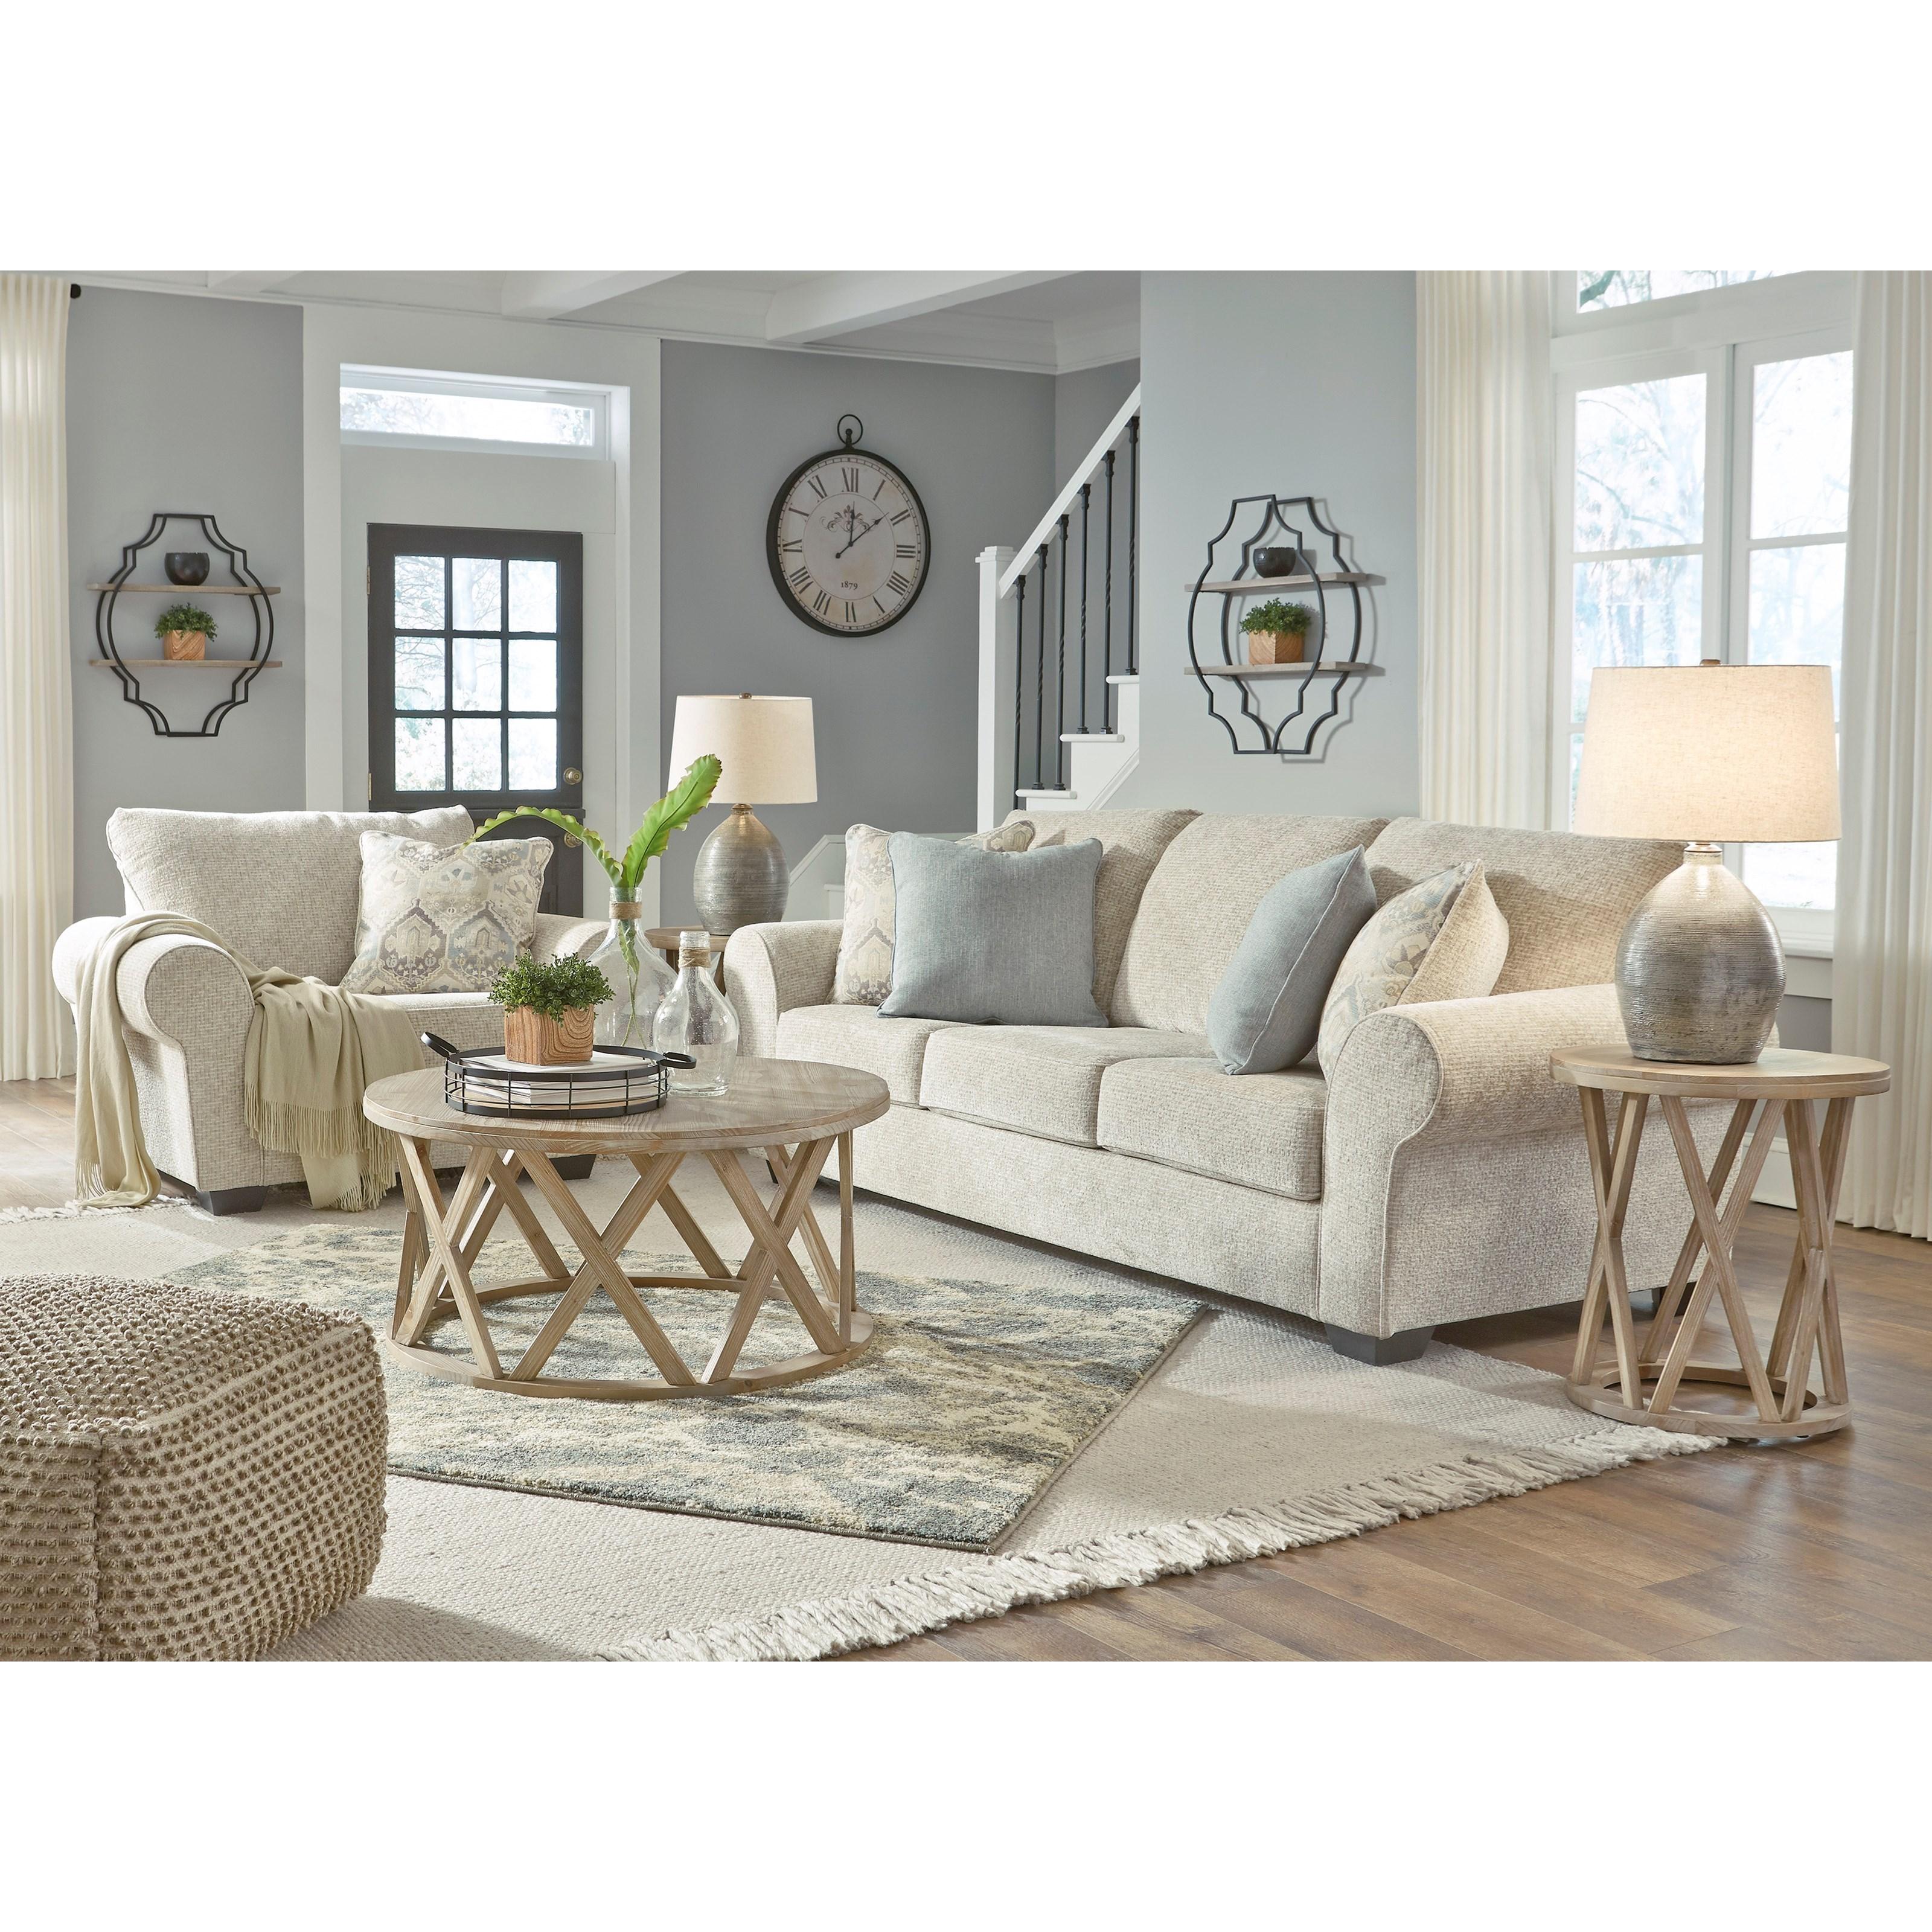 Benchcraft Haisley Stationary Living Room Group Rife S Home Furniture Stationary Living Room Groups